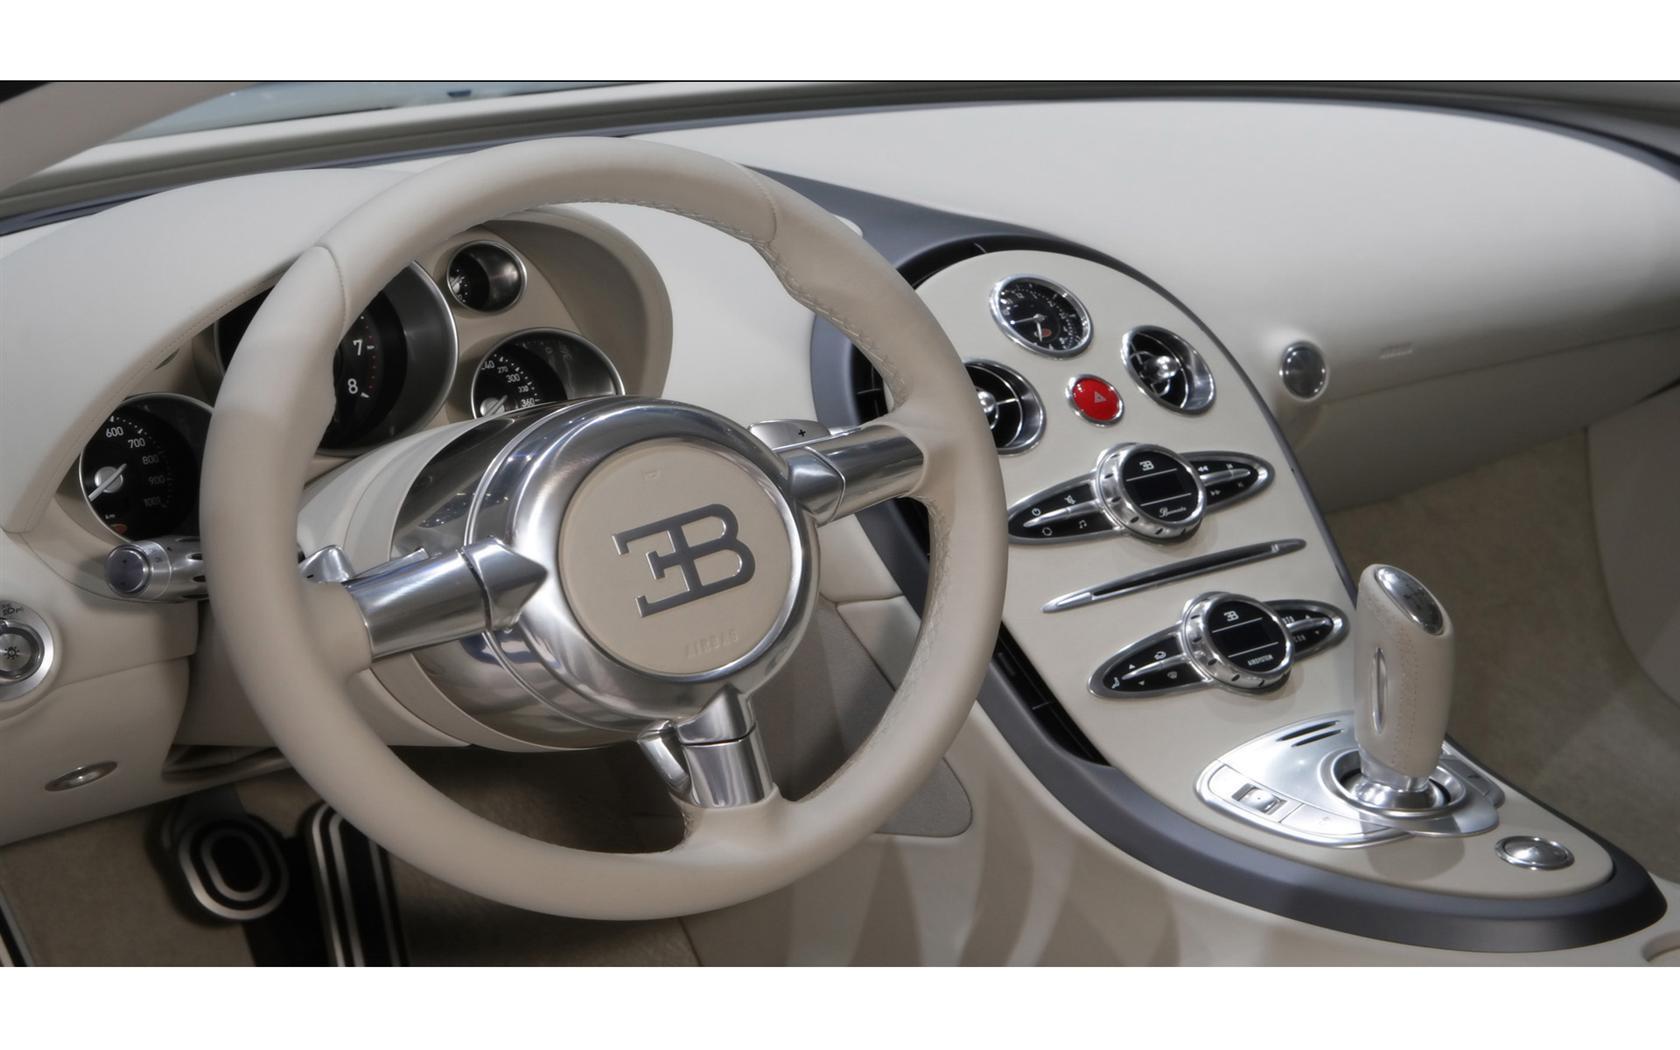 2009 bugatti veyron bleu centenaire desktop wallpaper and. Black Bedroom Furniture Sets. Home Design Ideas